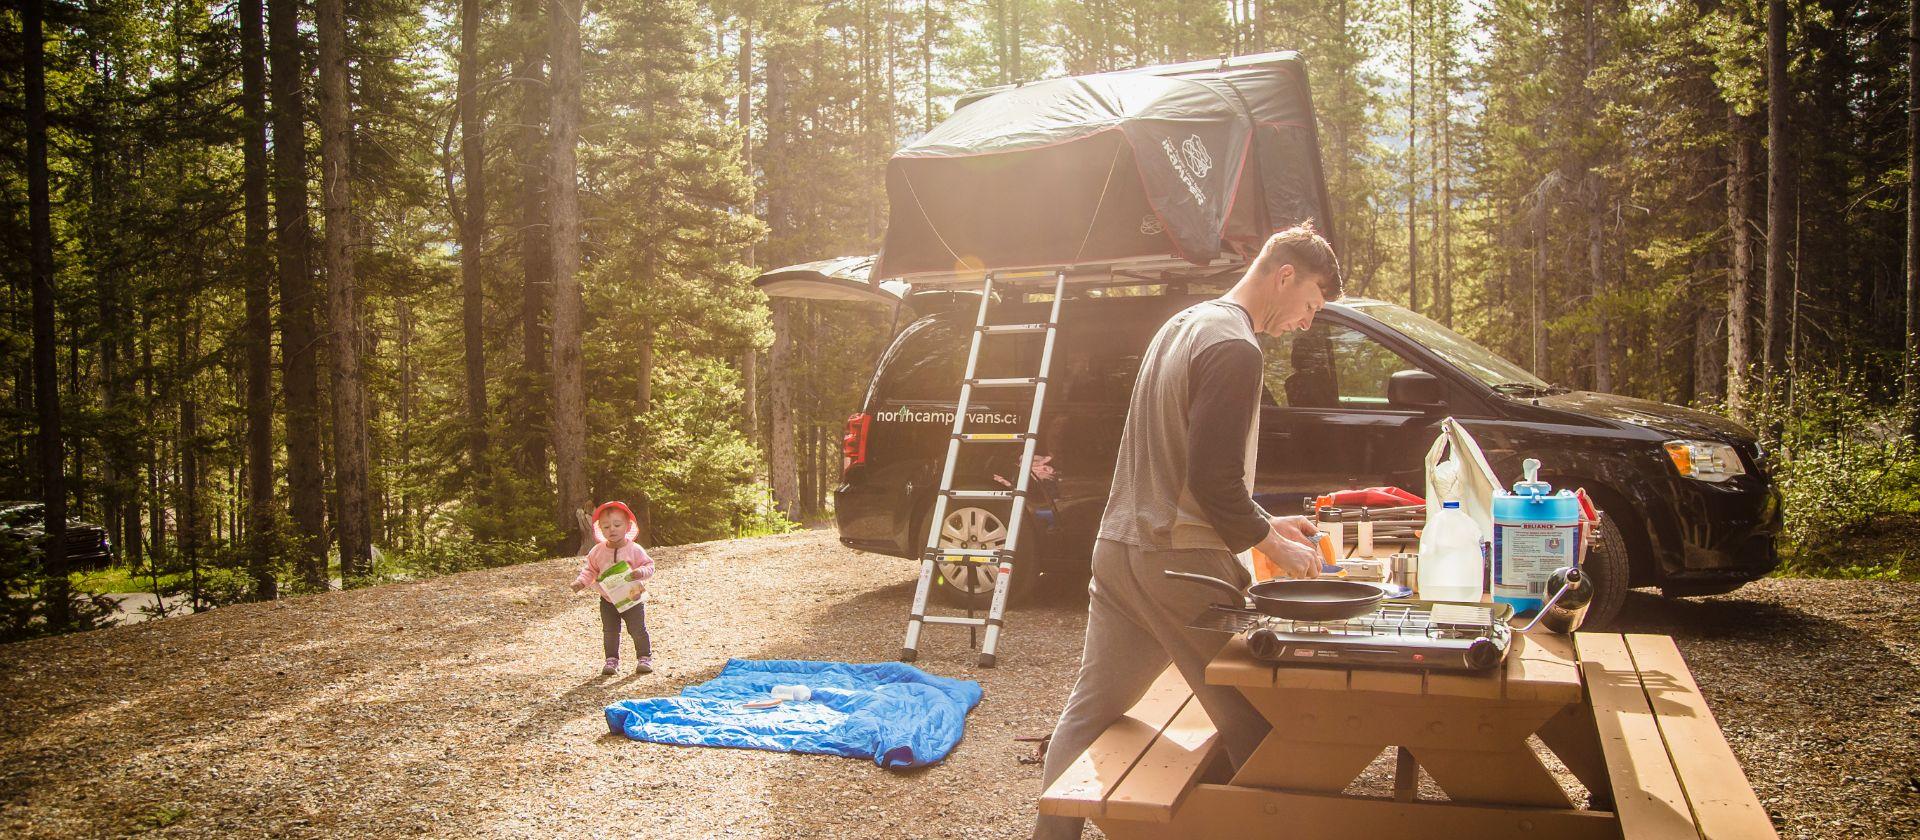 North Campervans Campervan and Rooftop Tent Rentals Calgary